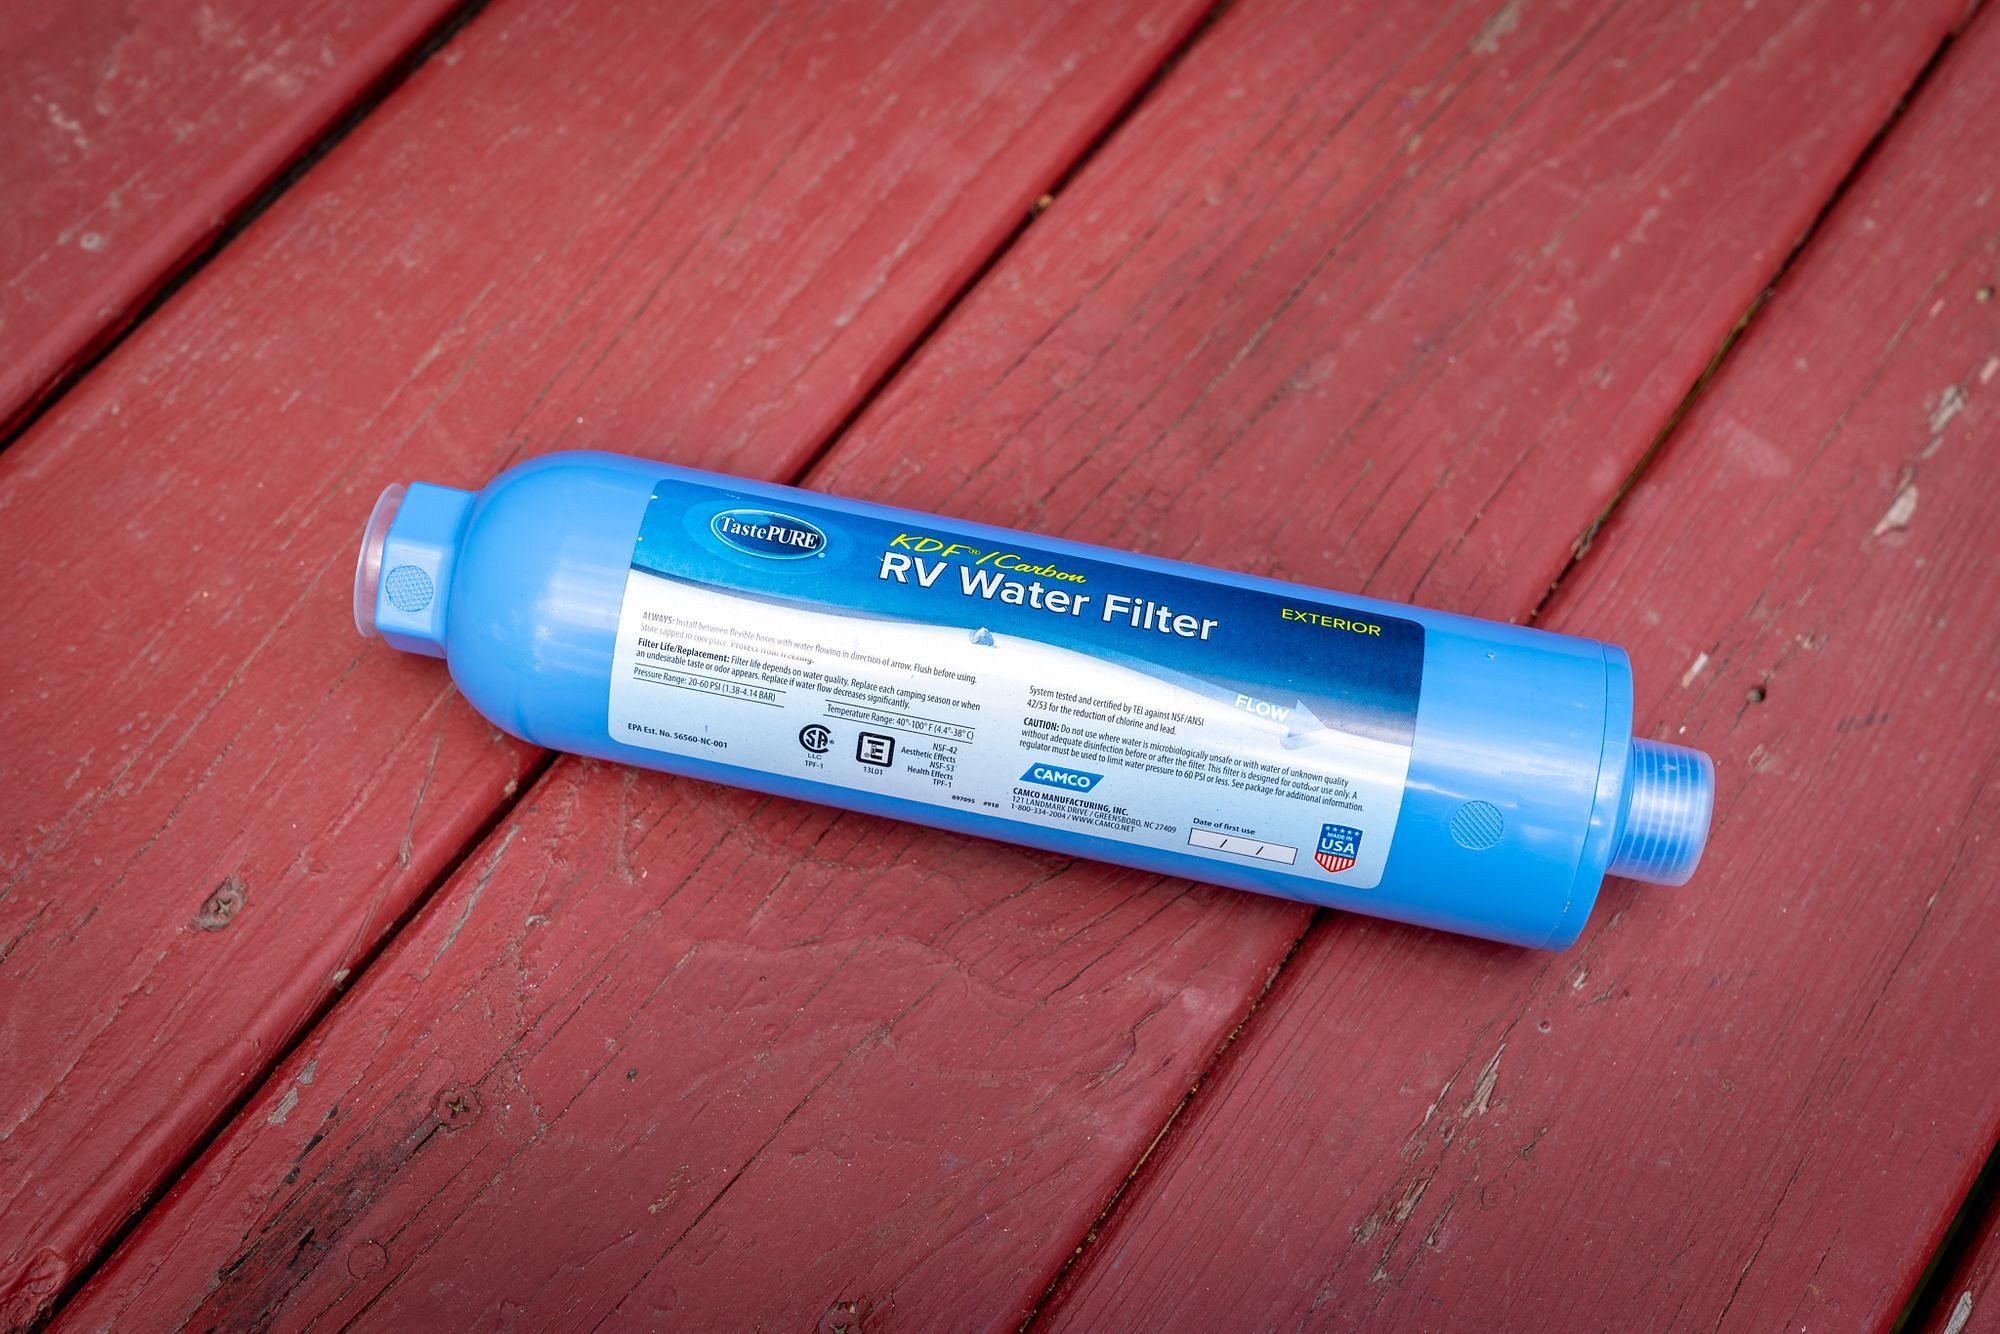 RV Water Filter